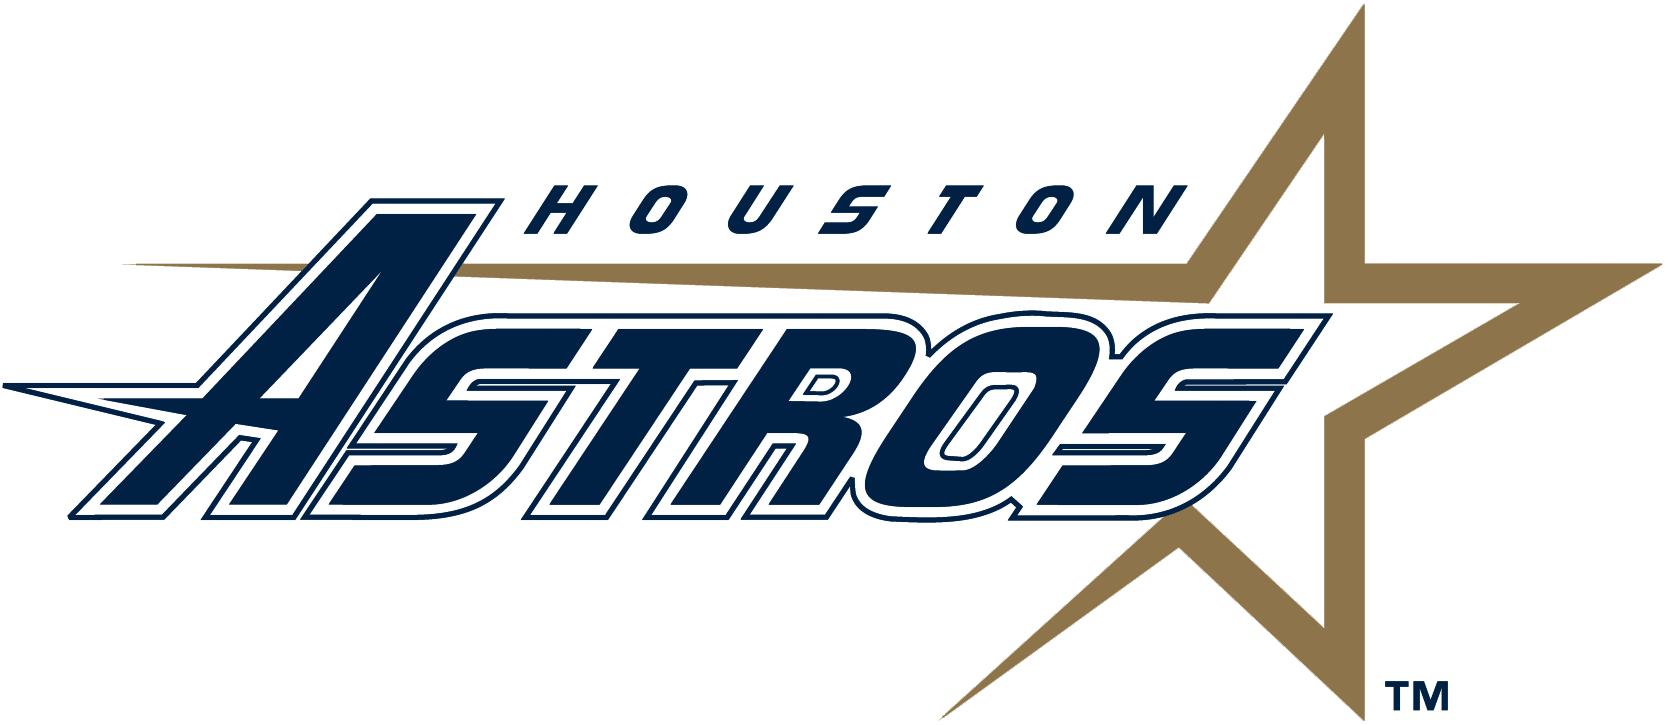 huge discount 0fc9f 1cc7c Houston Astros Primary Logo - National League (NL) - Chris ...